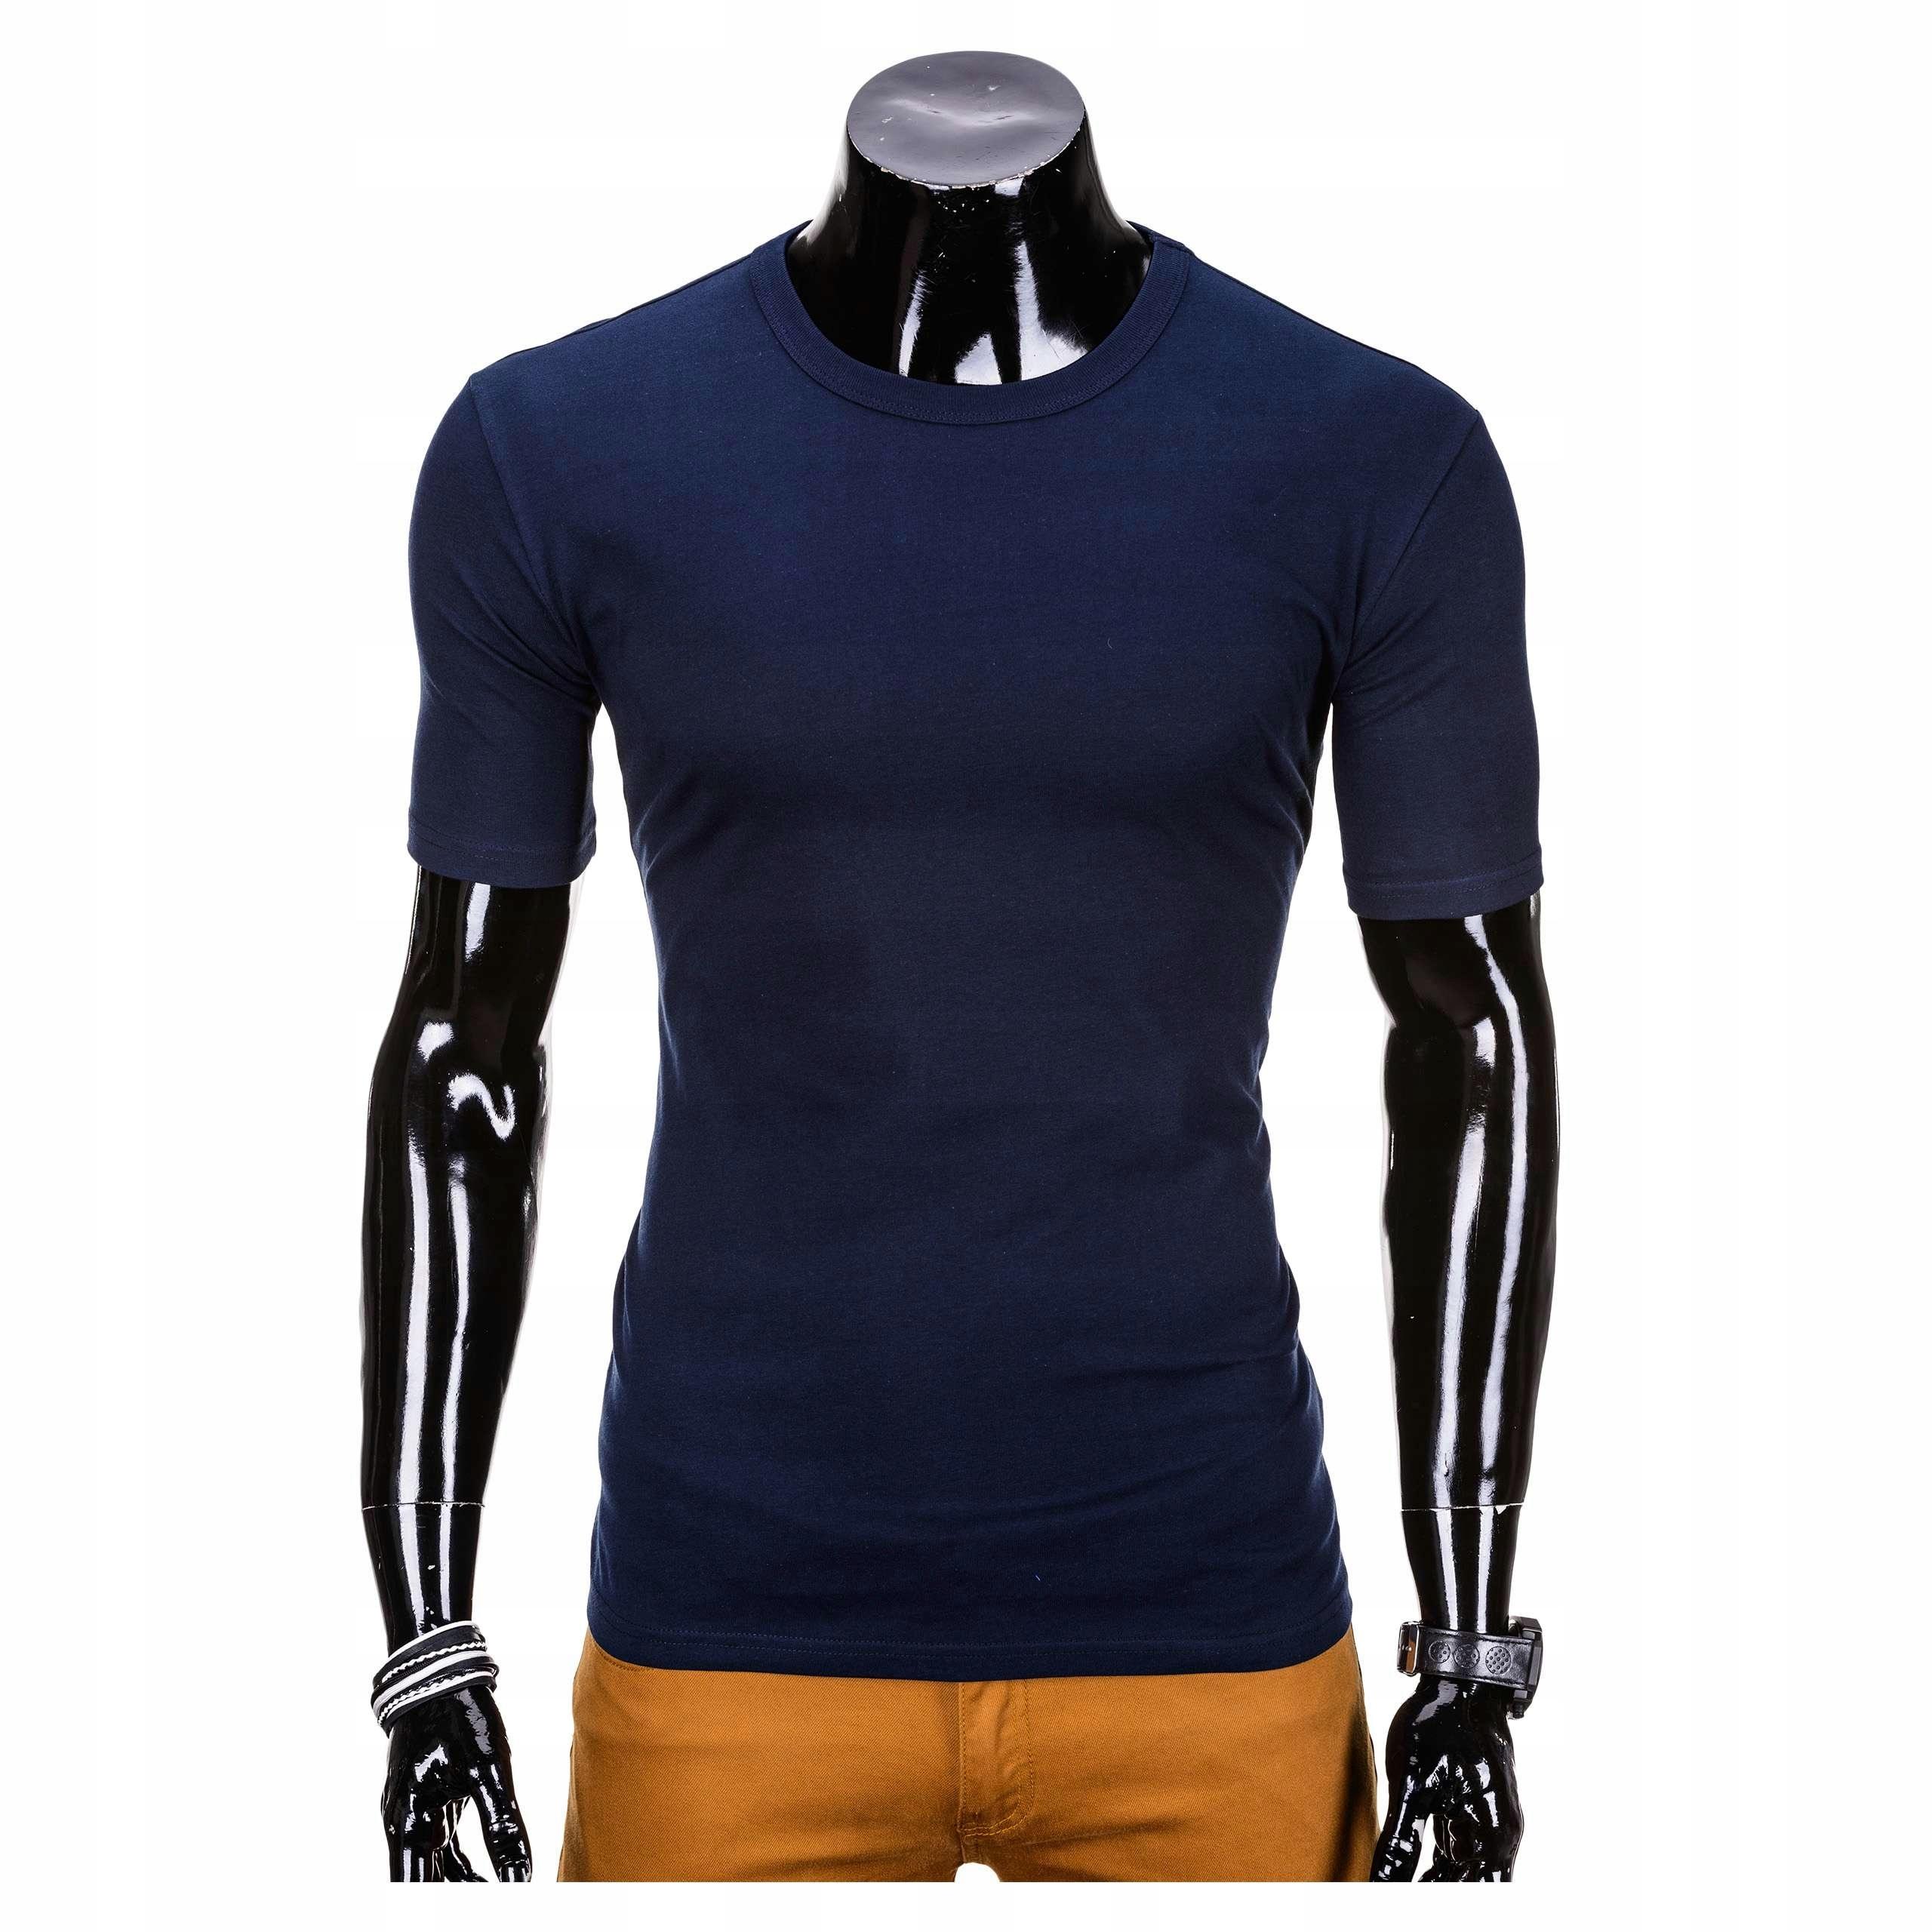 68b356c58ea5ea Koszulka t-shirt gładki OMBRE S620 granatowa L - 7398146377 ...